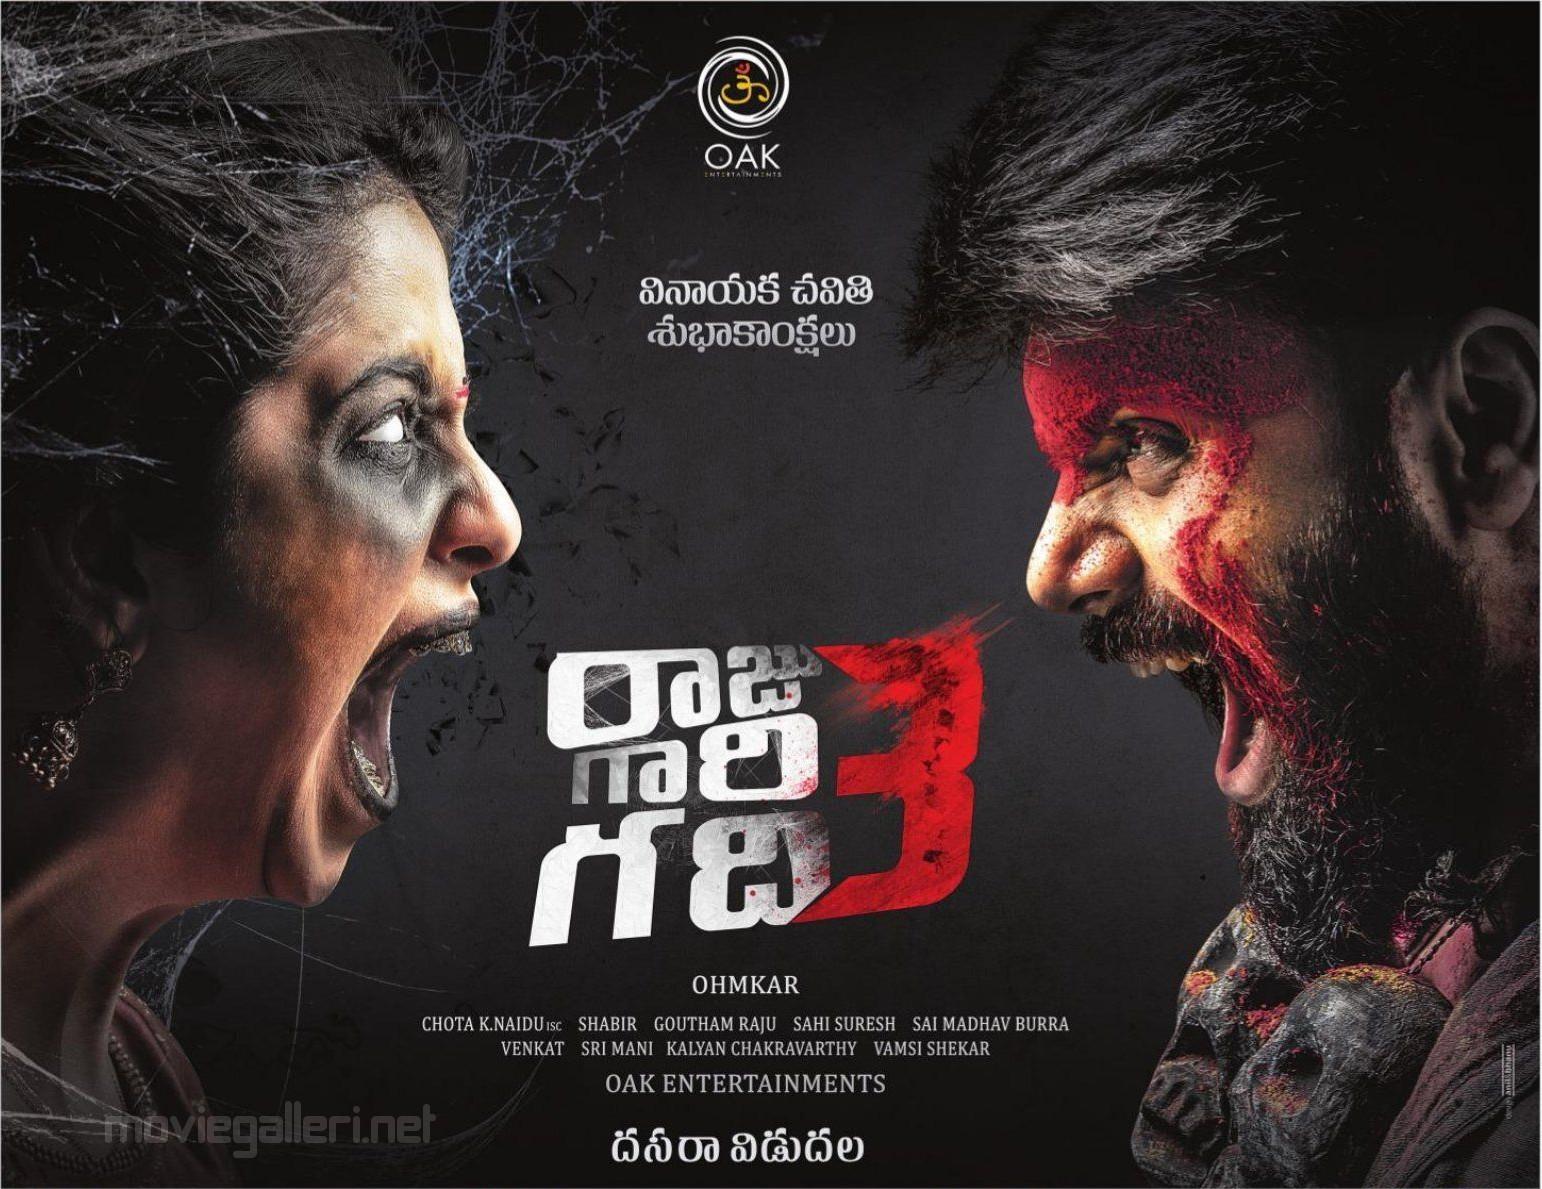 Avika Gor Ashwin Babu Raju Gari Gadhi 3 Movie Vinayaka Chavithi Wishes Poster HD